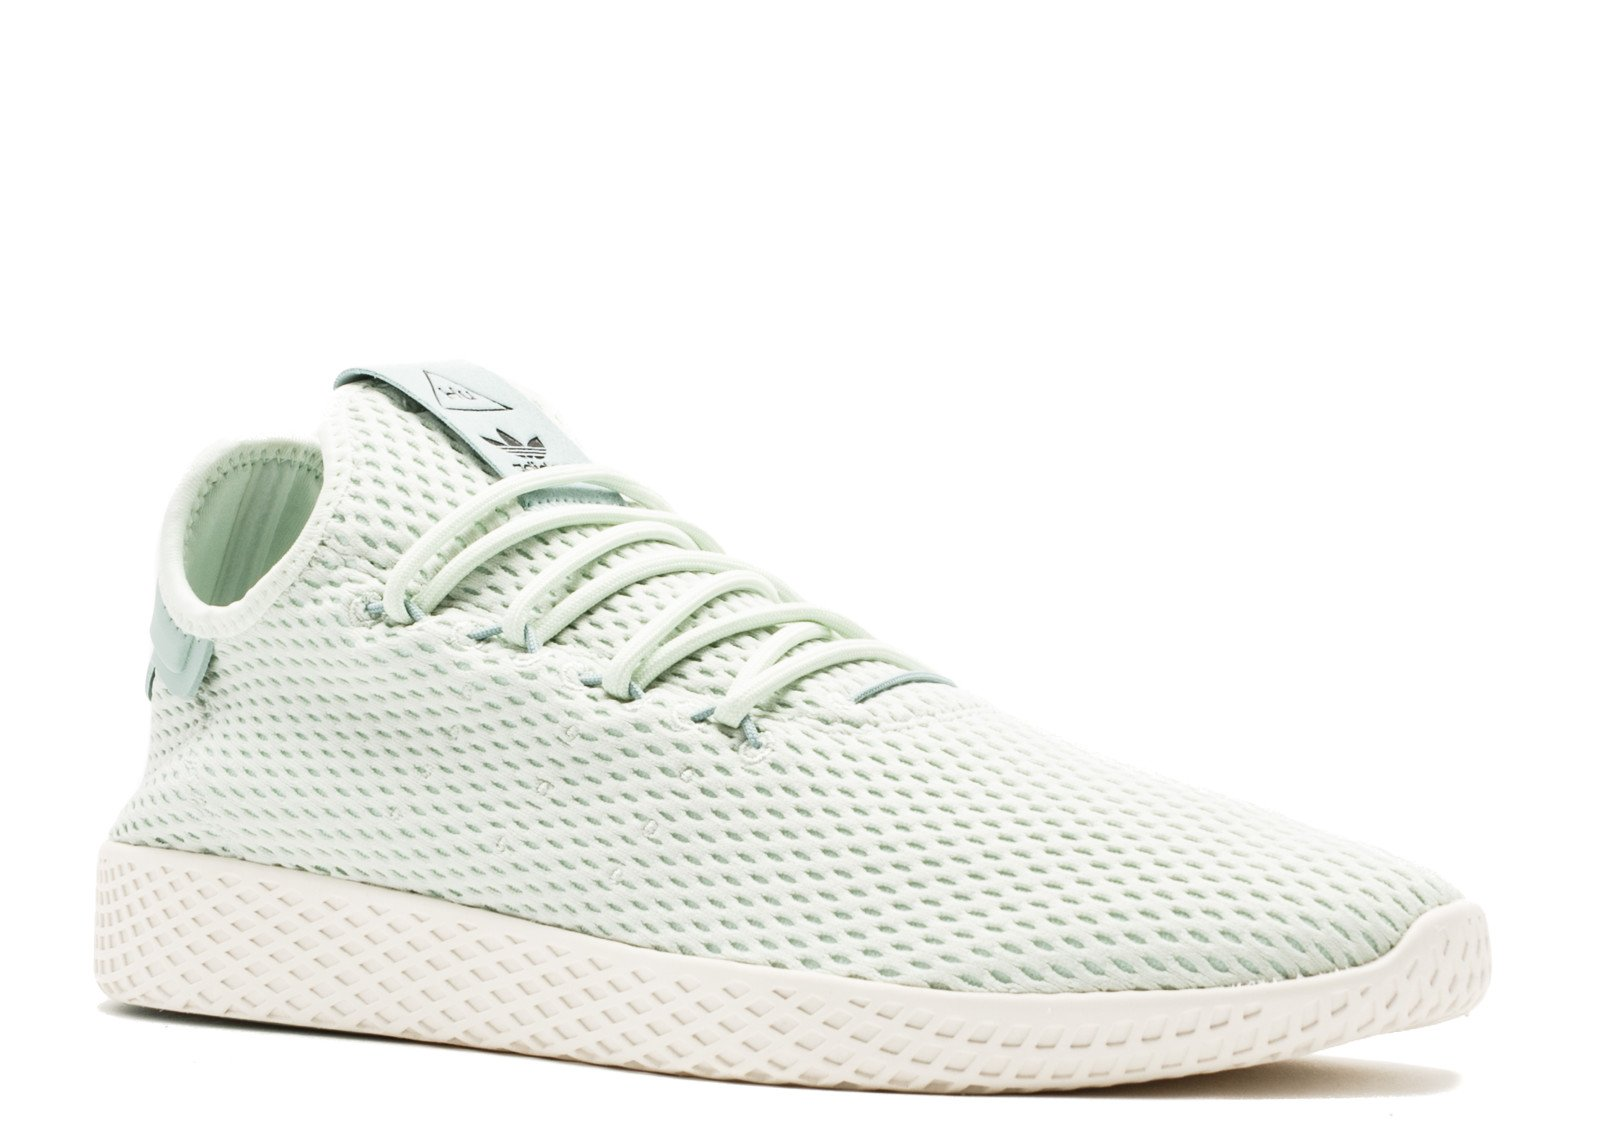 ac36ed70b53c0 Galleon - Adidas Mens Pharrell Williams Tennis HU Athletic Shoe (13 D(M)  US